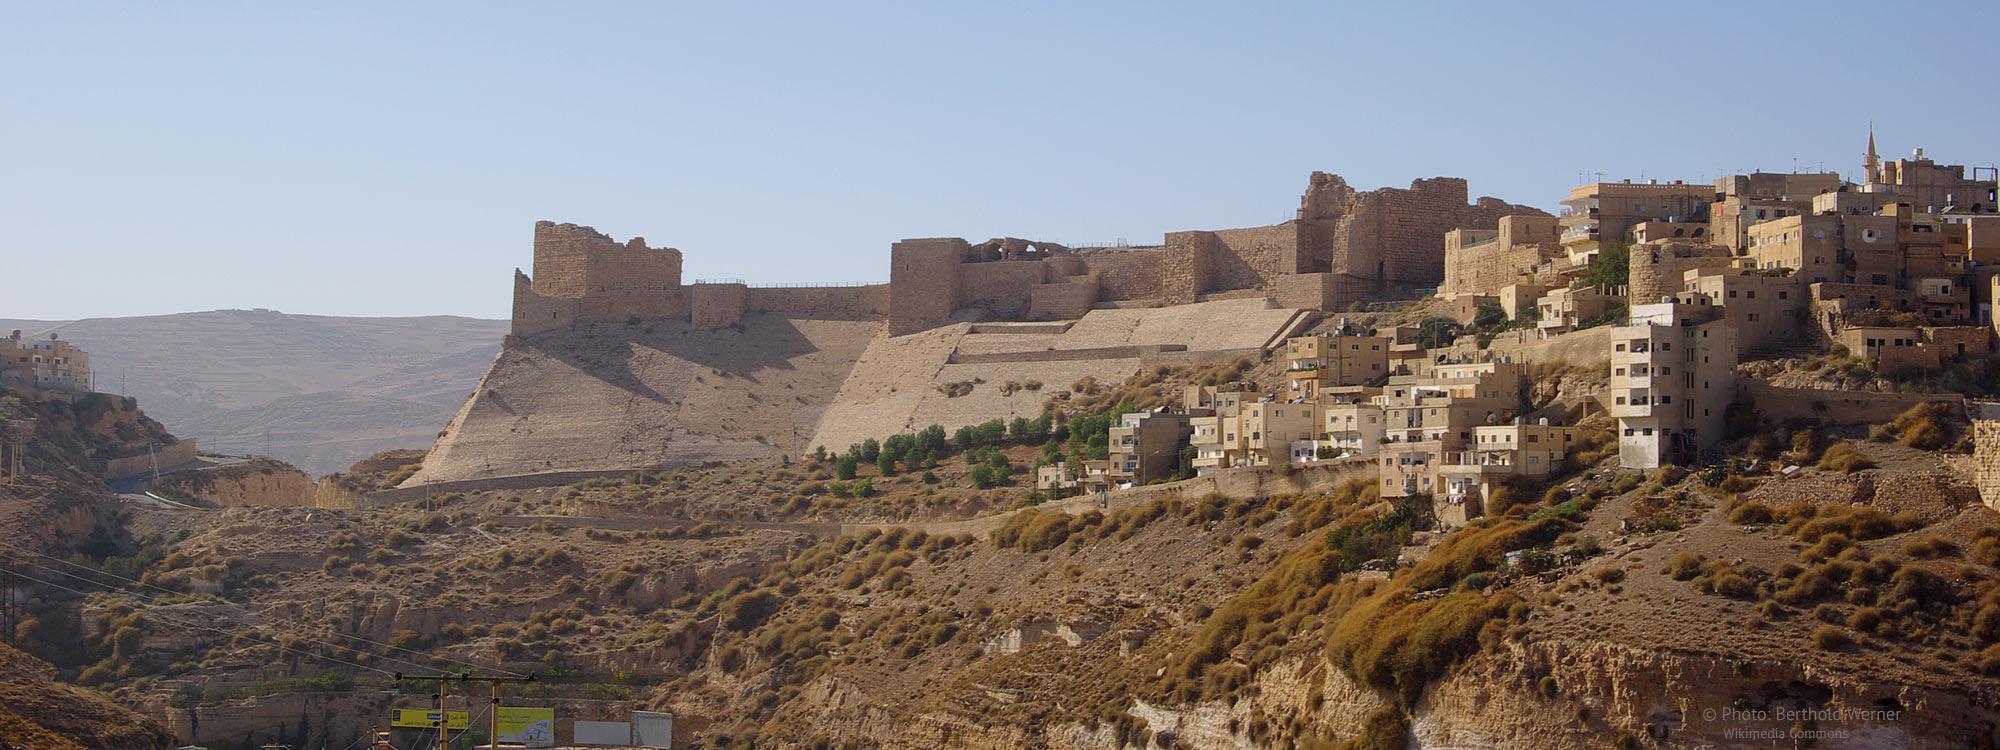 Castillo de Karak